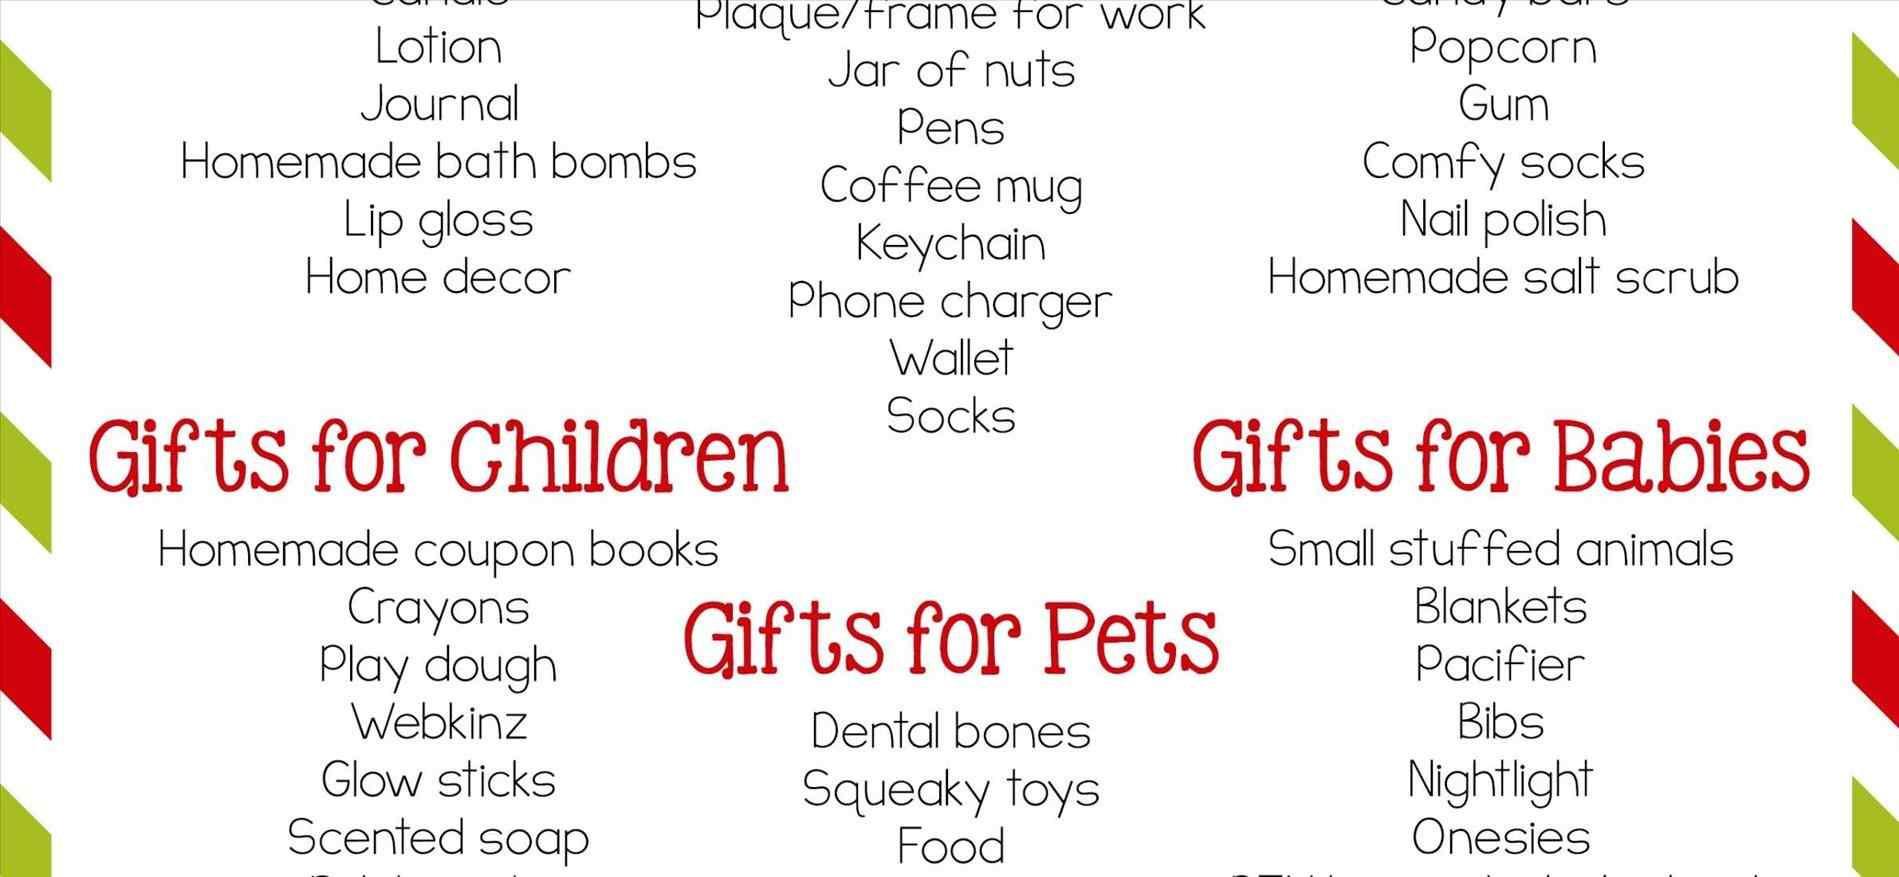 Best ideas about Secret Santa Gift Ideas Under $5 . Save or Pin Secret Santa Gift Ideas Under $5 Now.